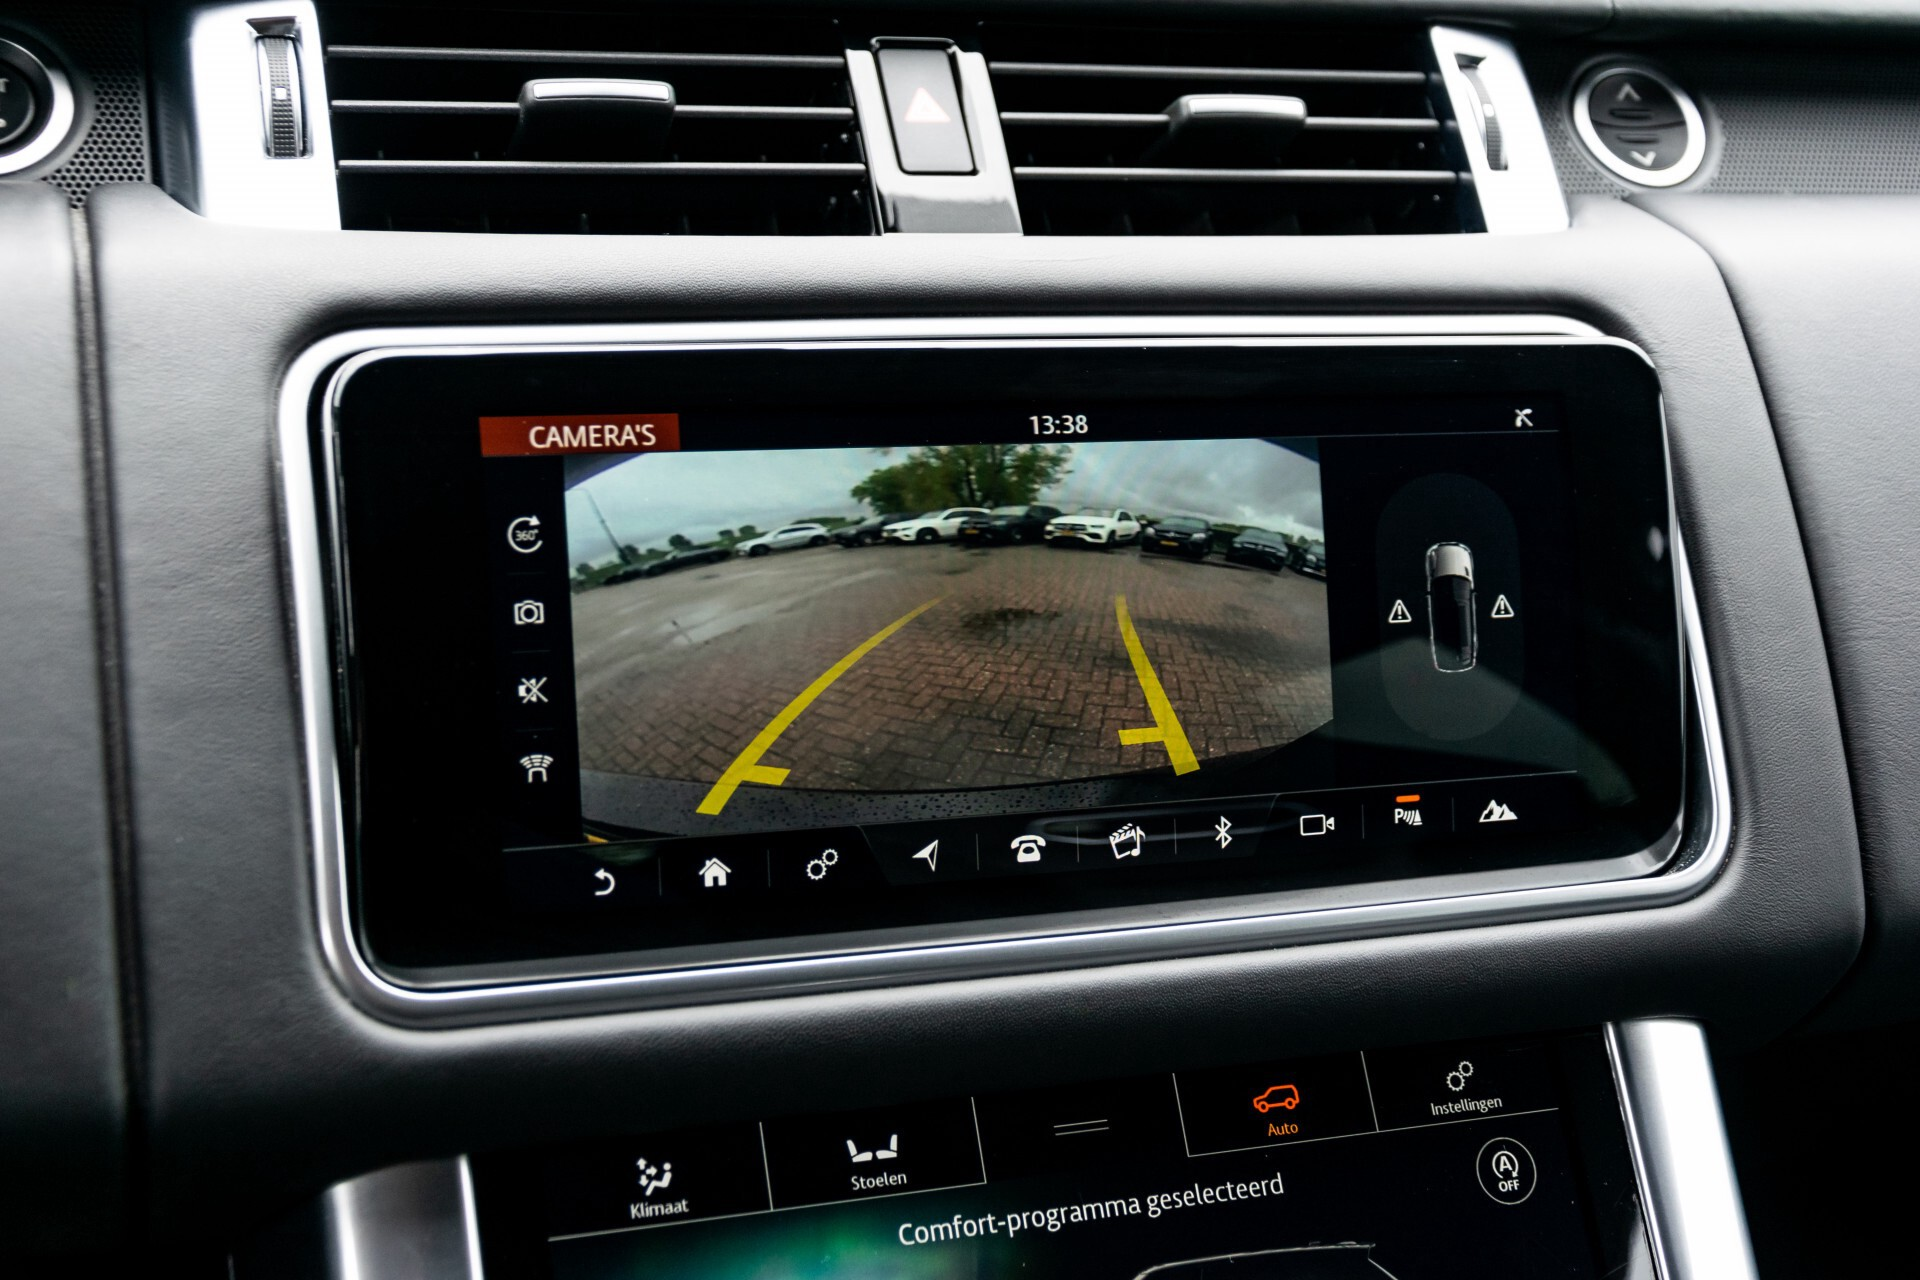 Land Rover Range Rover Sport SVR 5.0 Supercharged 575pk Full Carbon Nieuwprijs €241377 Foto 29